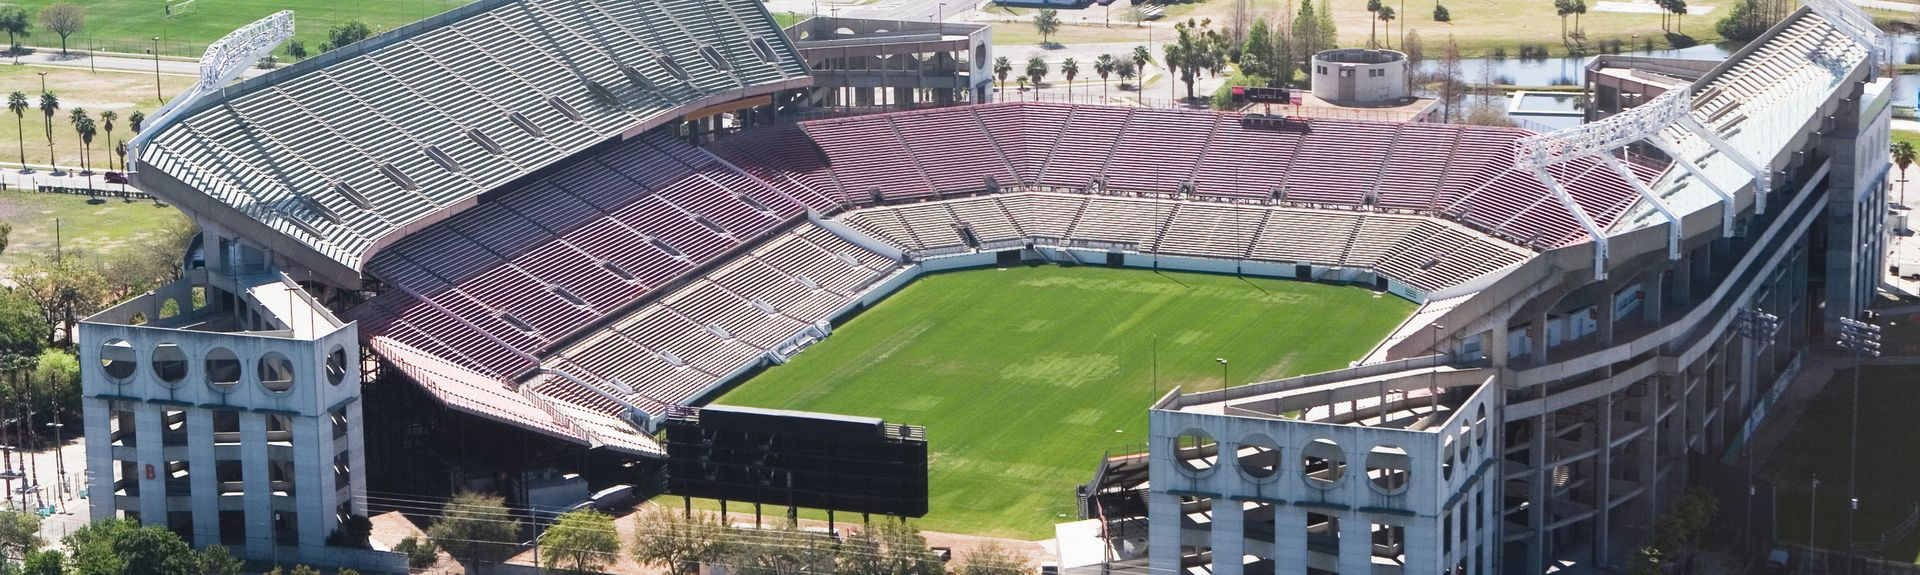 Camping World Stadium, Orlando, FL, USA